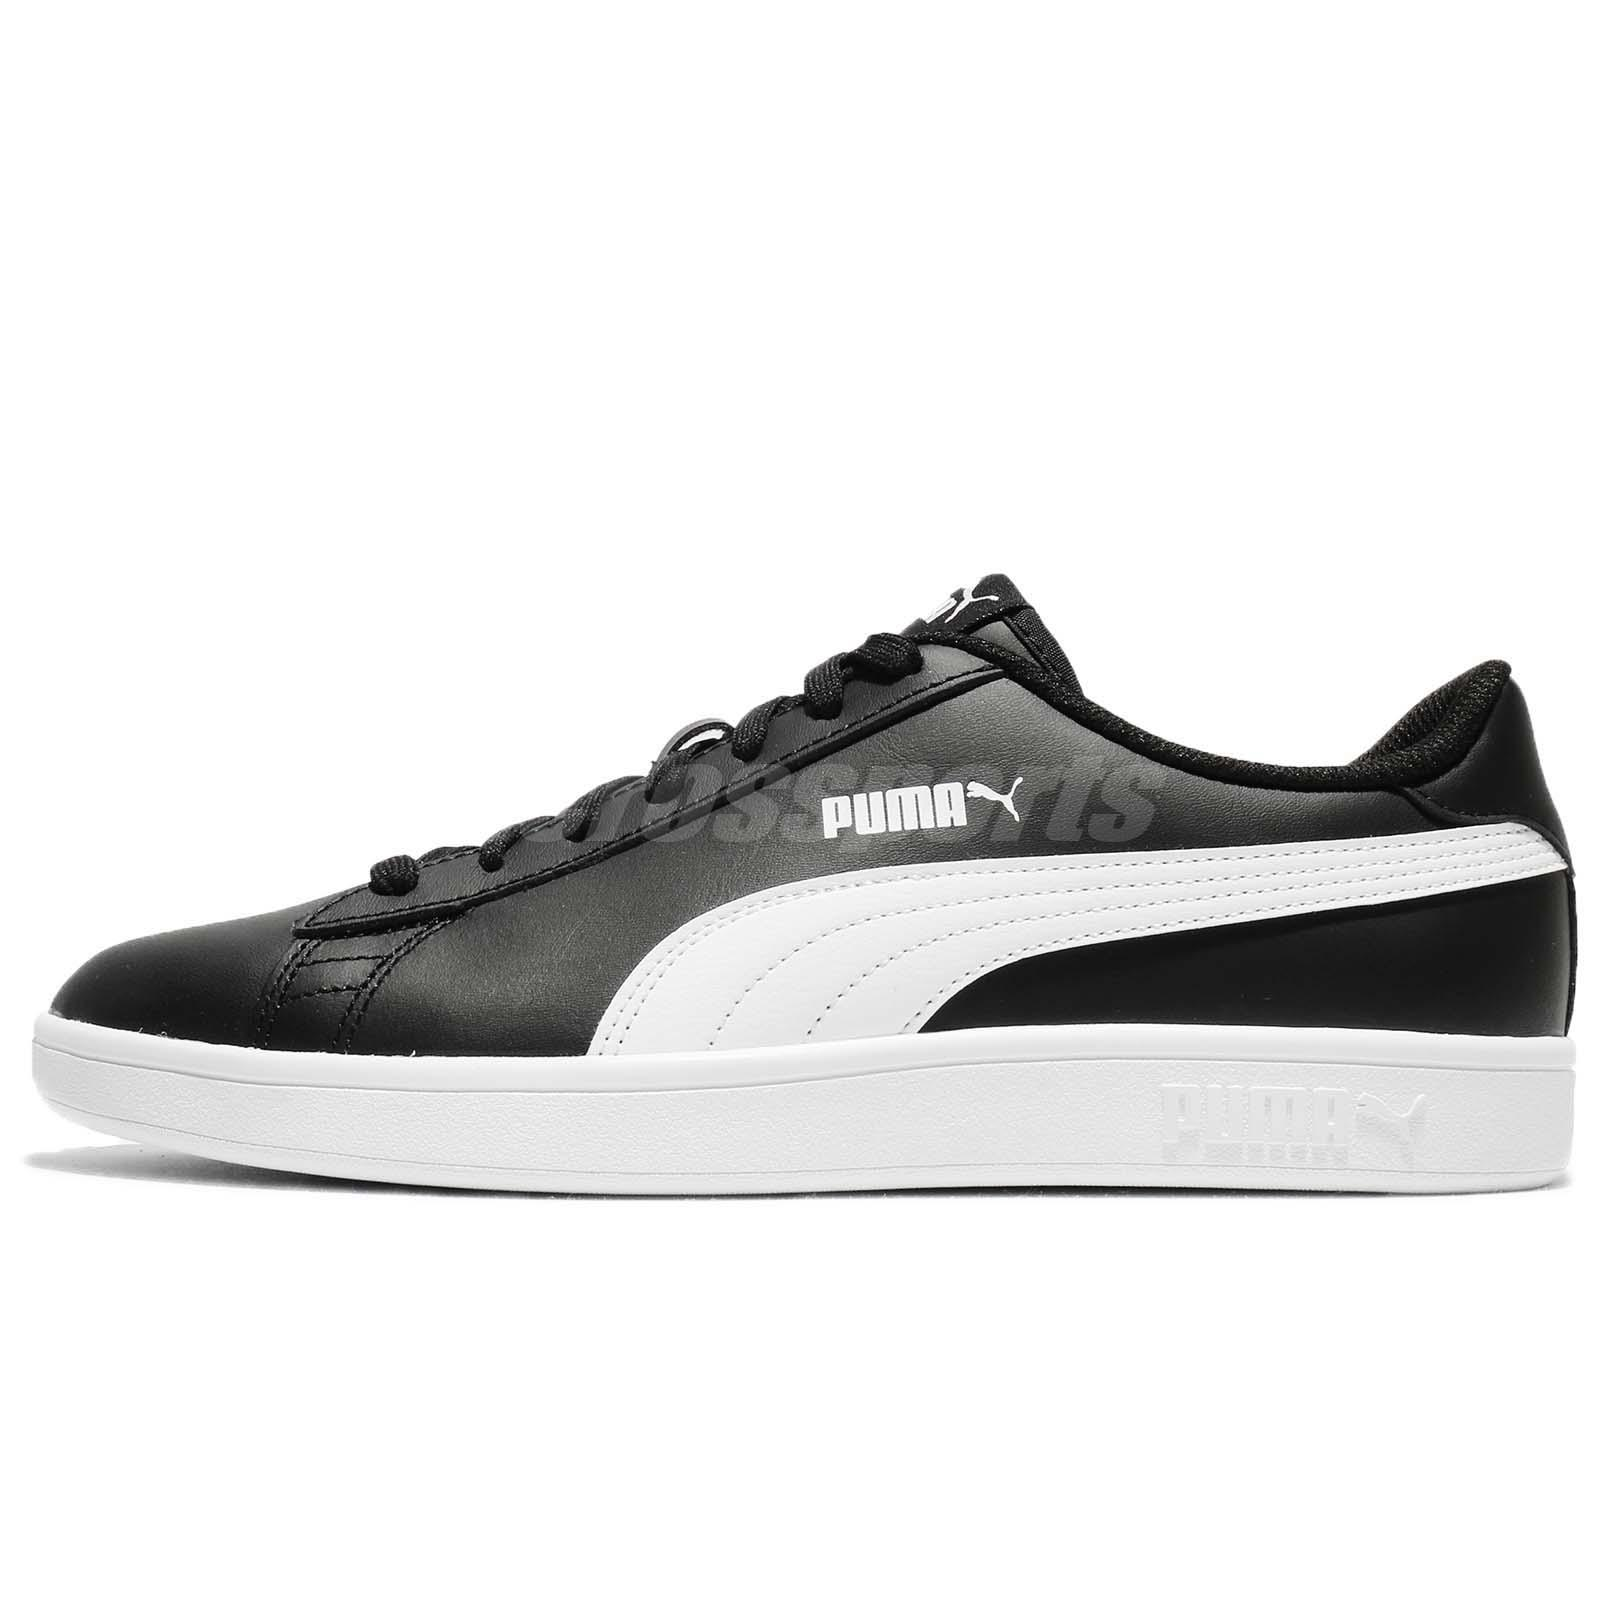 578ceb62de6 Puma Smash V2 L Black White Men Classic Shoes Sneakers Trainers 365215-04